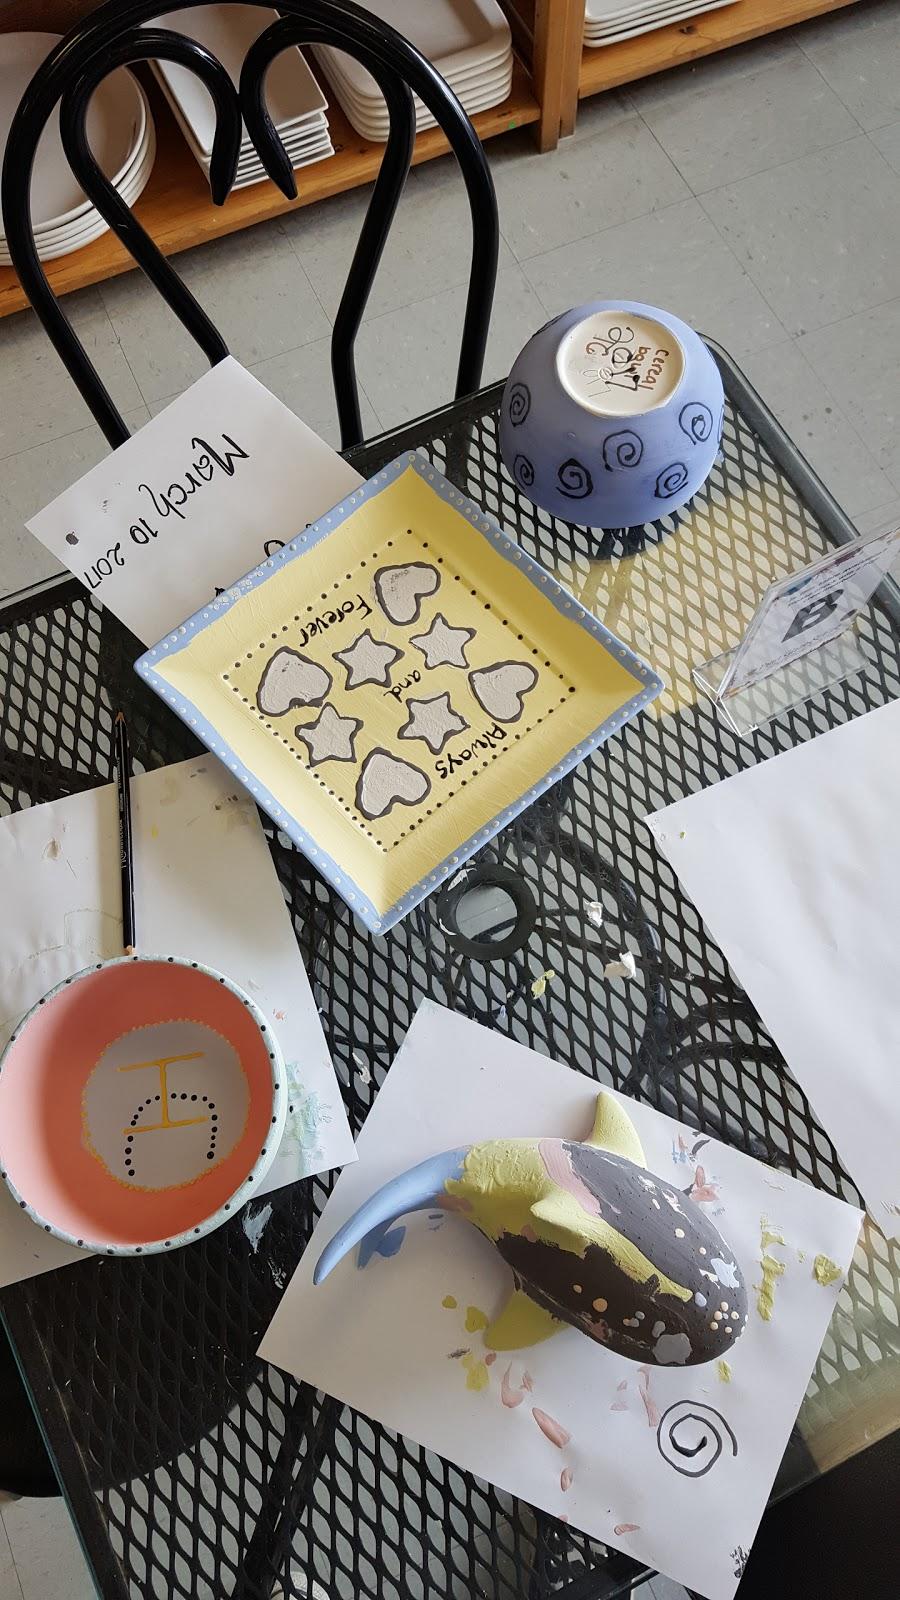 Paint Glaze & Fire | Ceramics & Coffee House - cafe  | Photo 4 of 10 | Address: 12683 Metcalf Ave, Overland Park, KS 66213, USA | Phone: (913) 661-2529